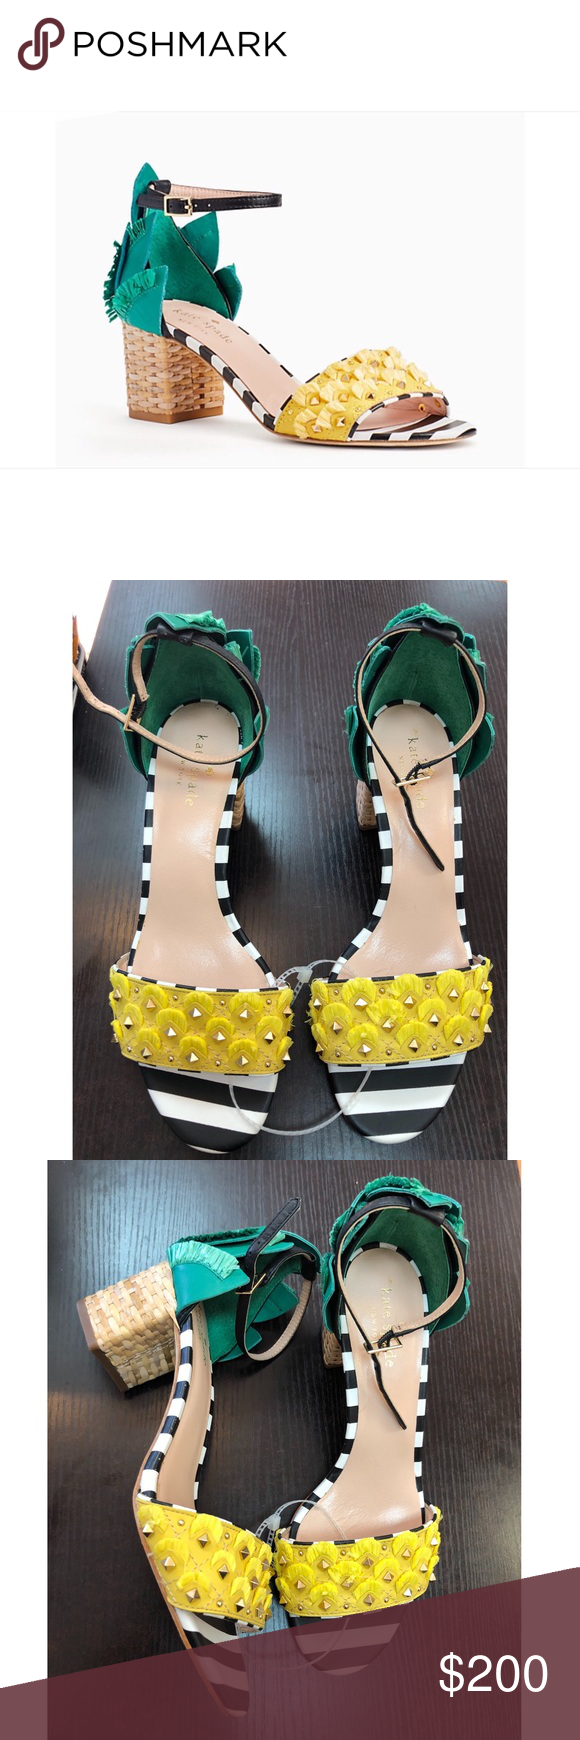 3f21c80513a6 Kate Spade Wiatt Sandals size 9 🍍🍍 Adorable!! Leather upper ...